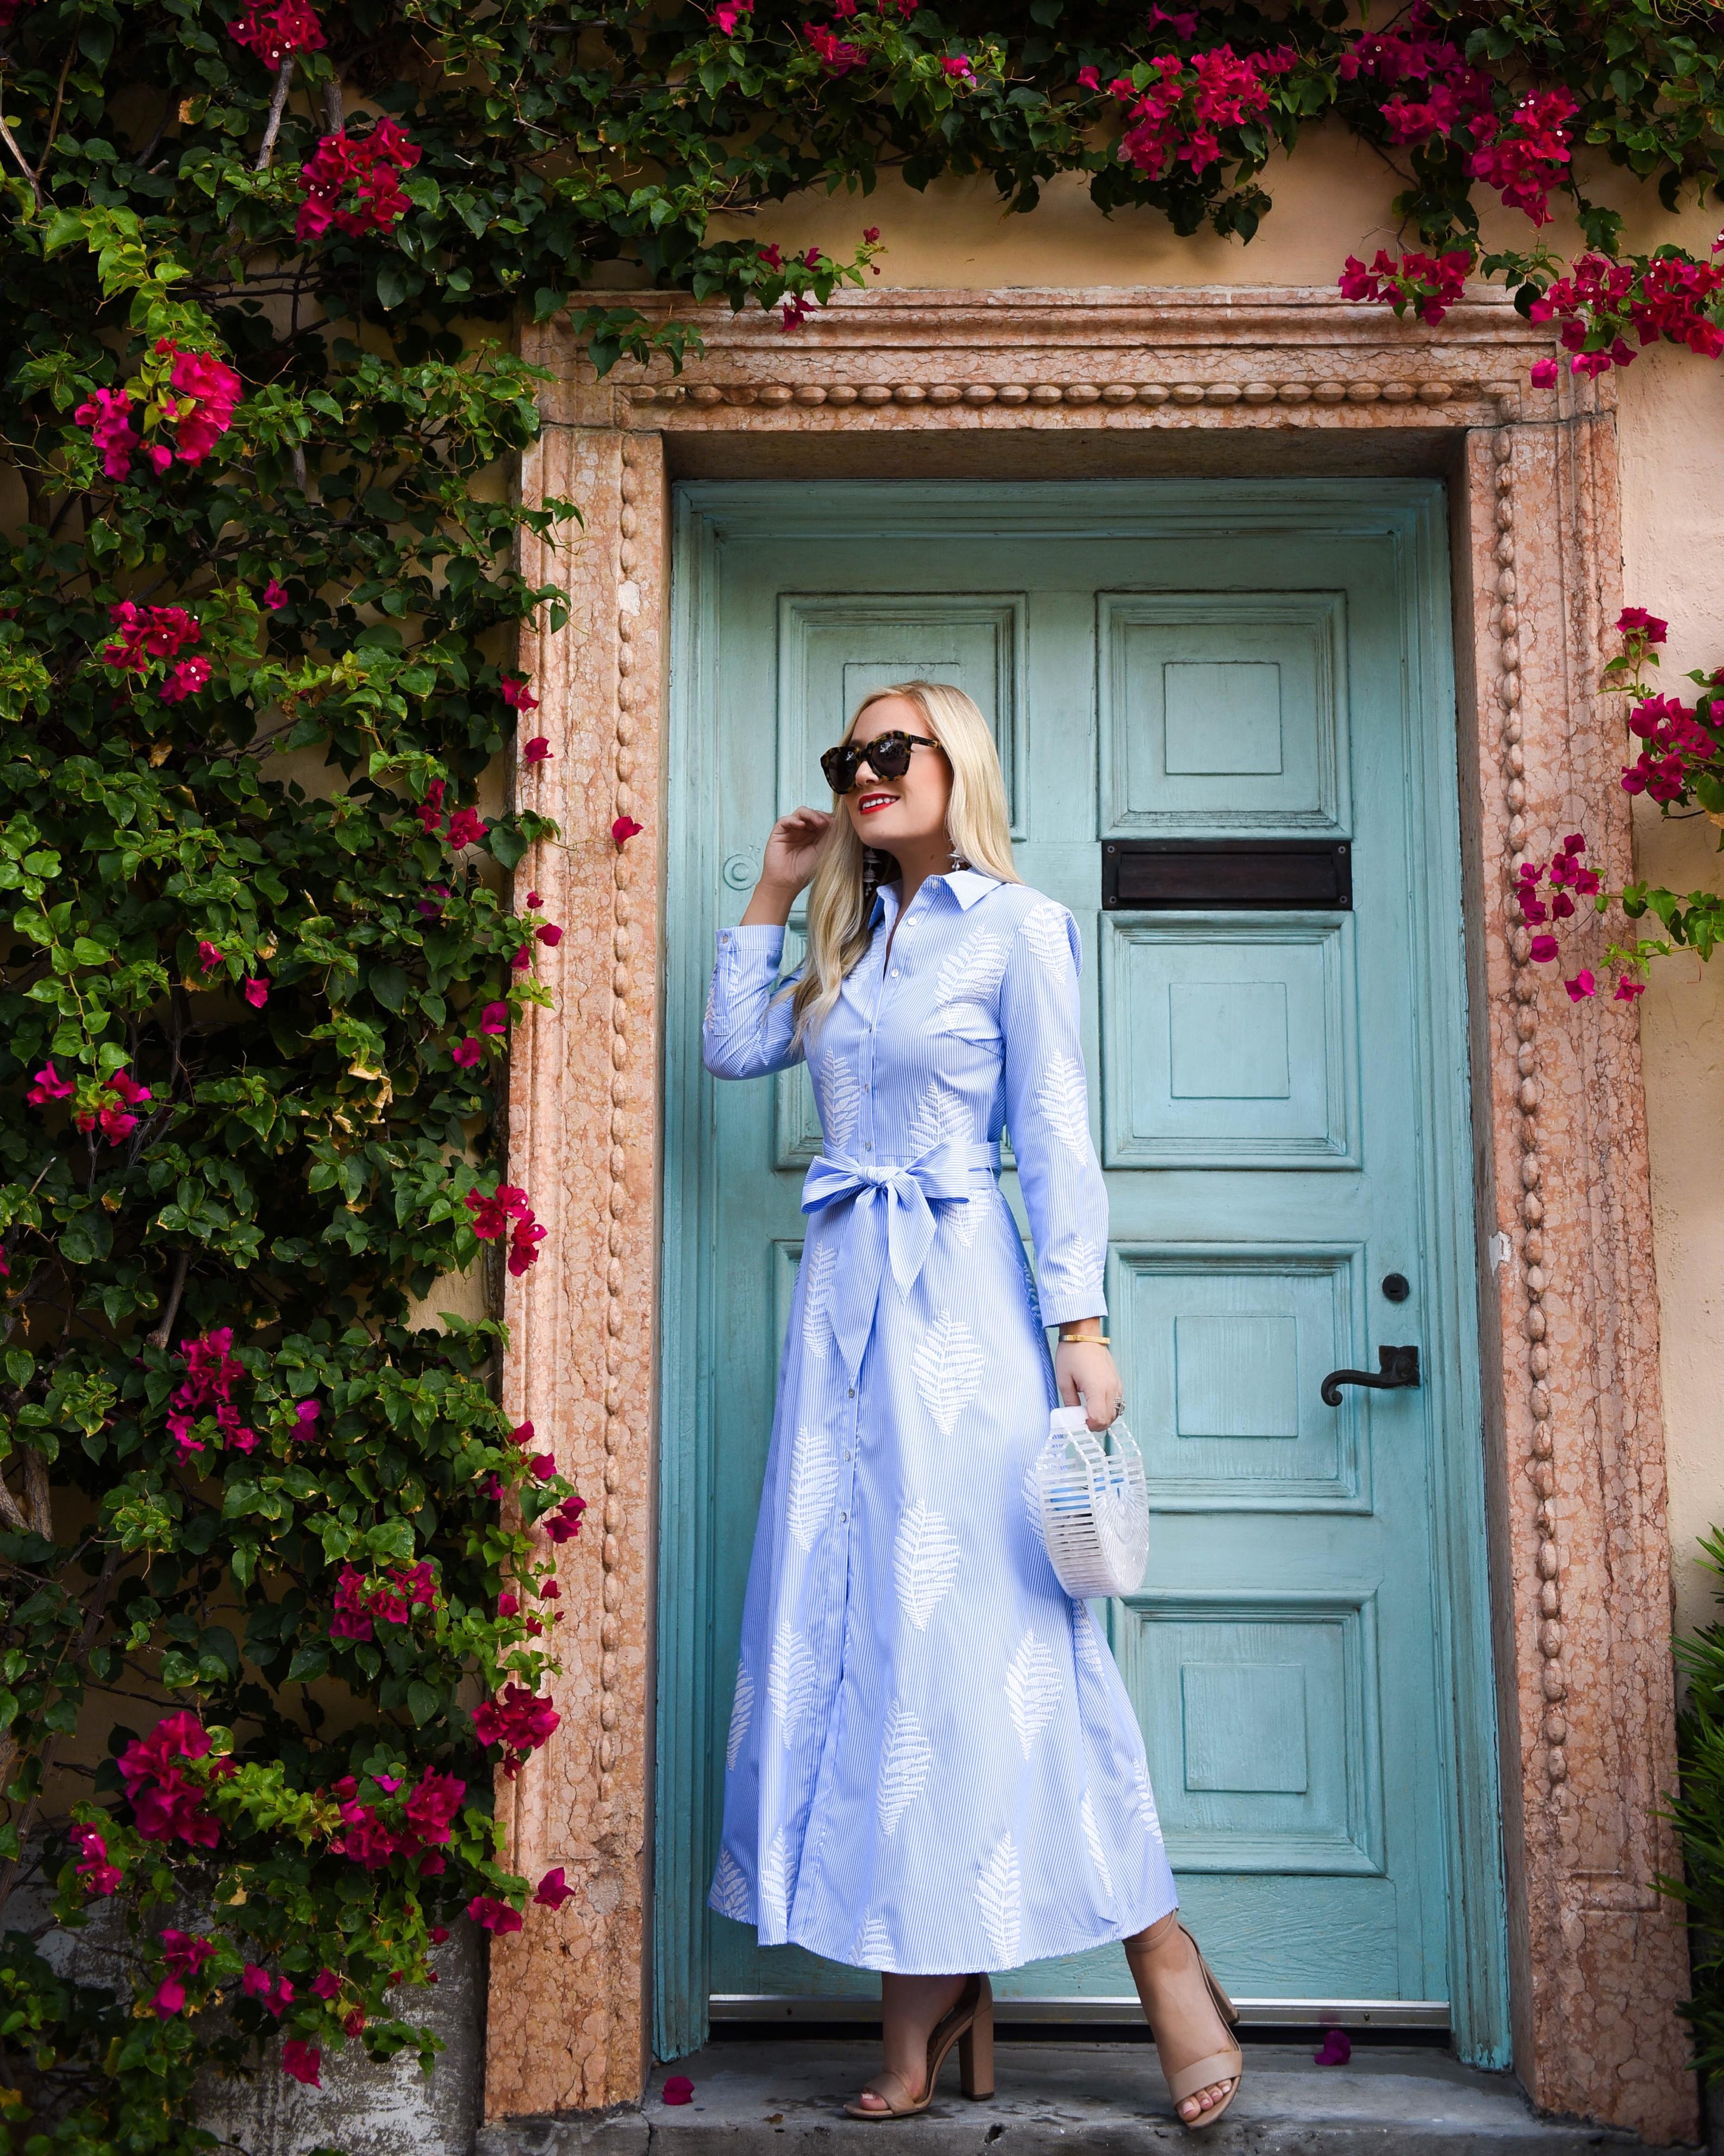 Palm Print Dress, Zara Dress, Blue and White Stripe Dress, Cult Gaia Arc Bag, Palm Beach, Travel Blogger, Lomurphy